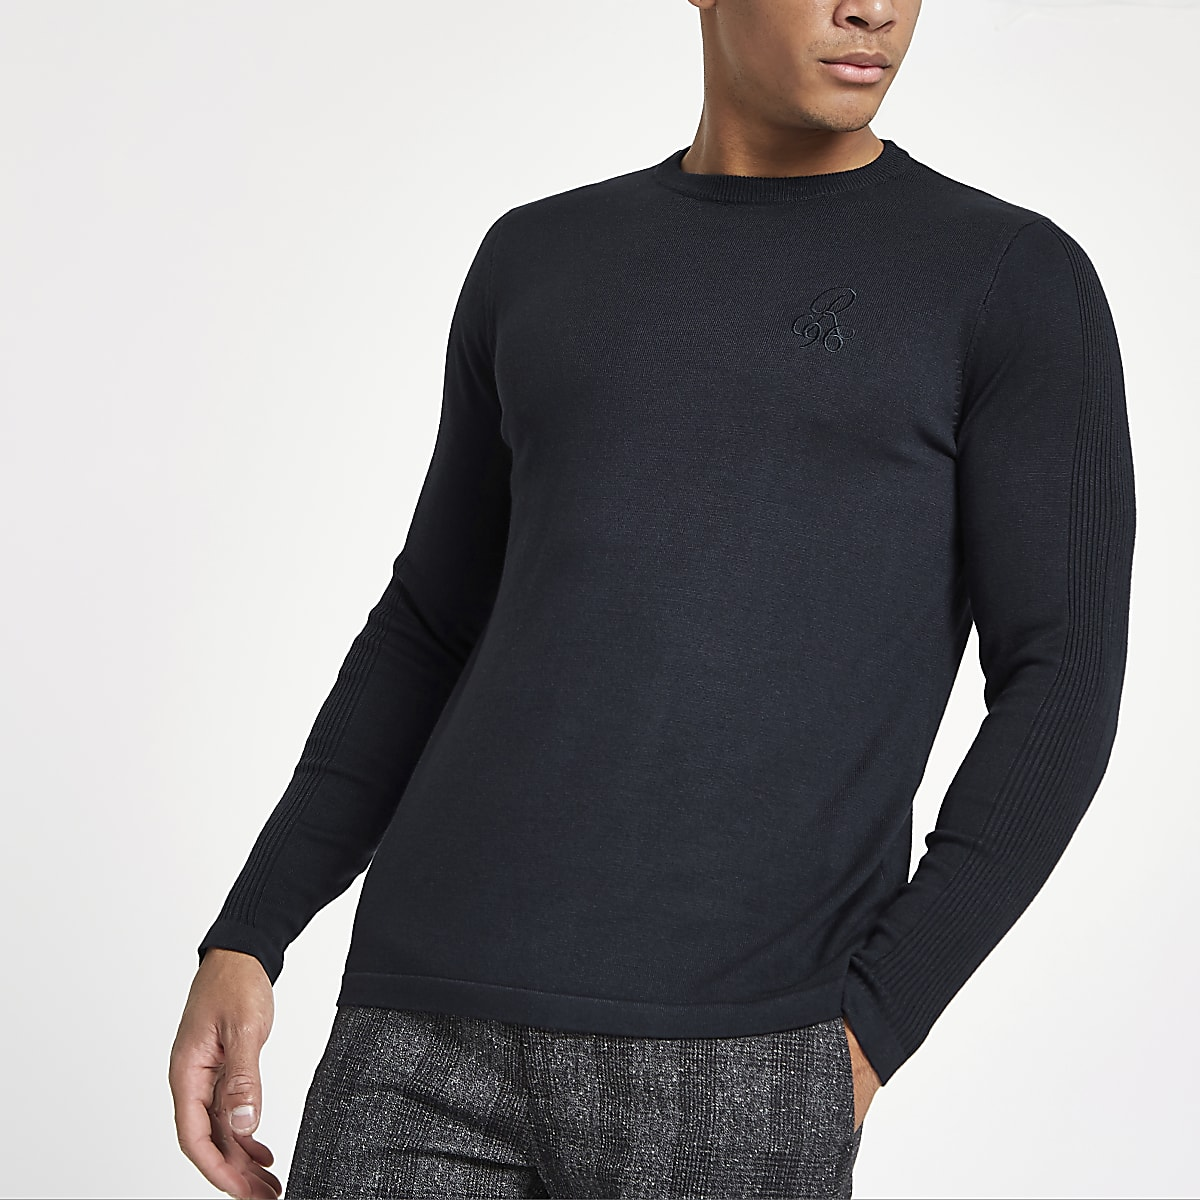 R96 navy slim fit crew neck sweater